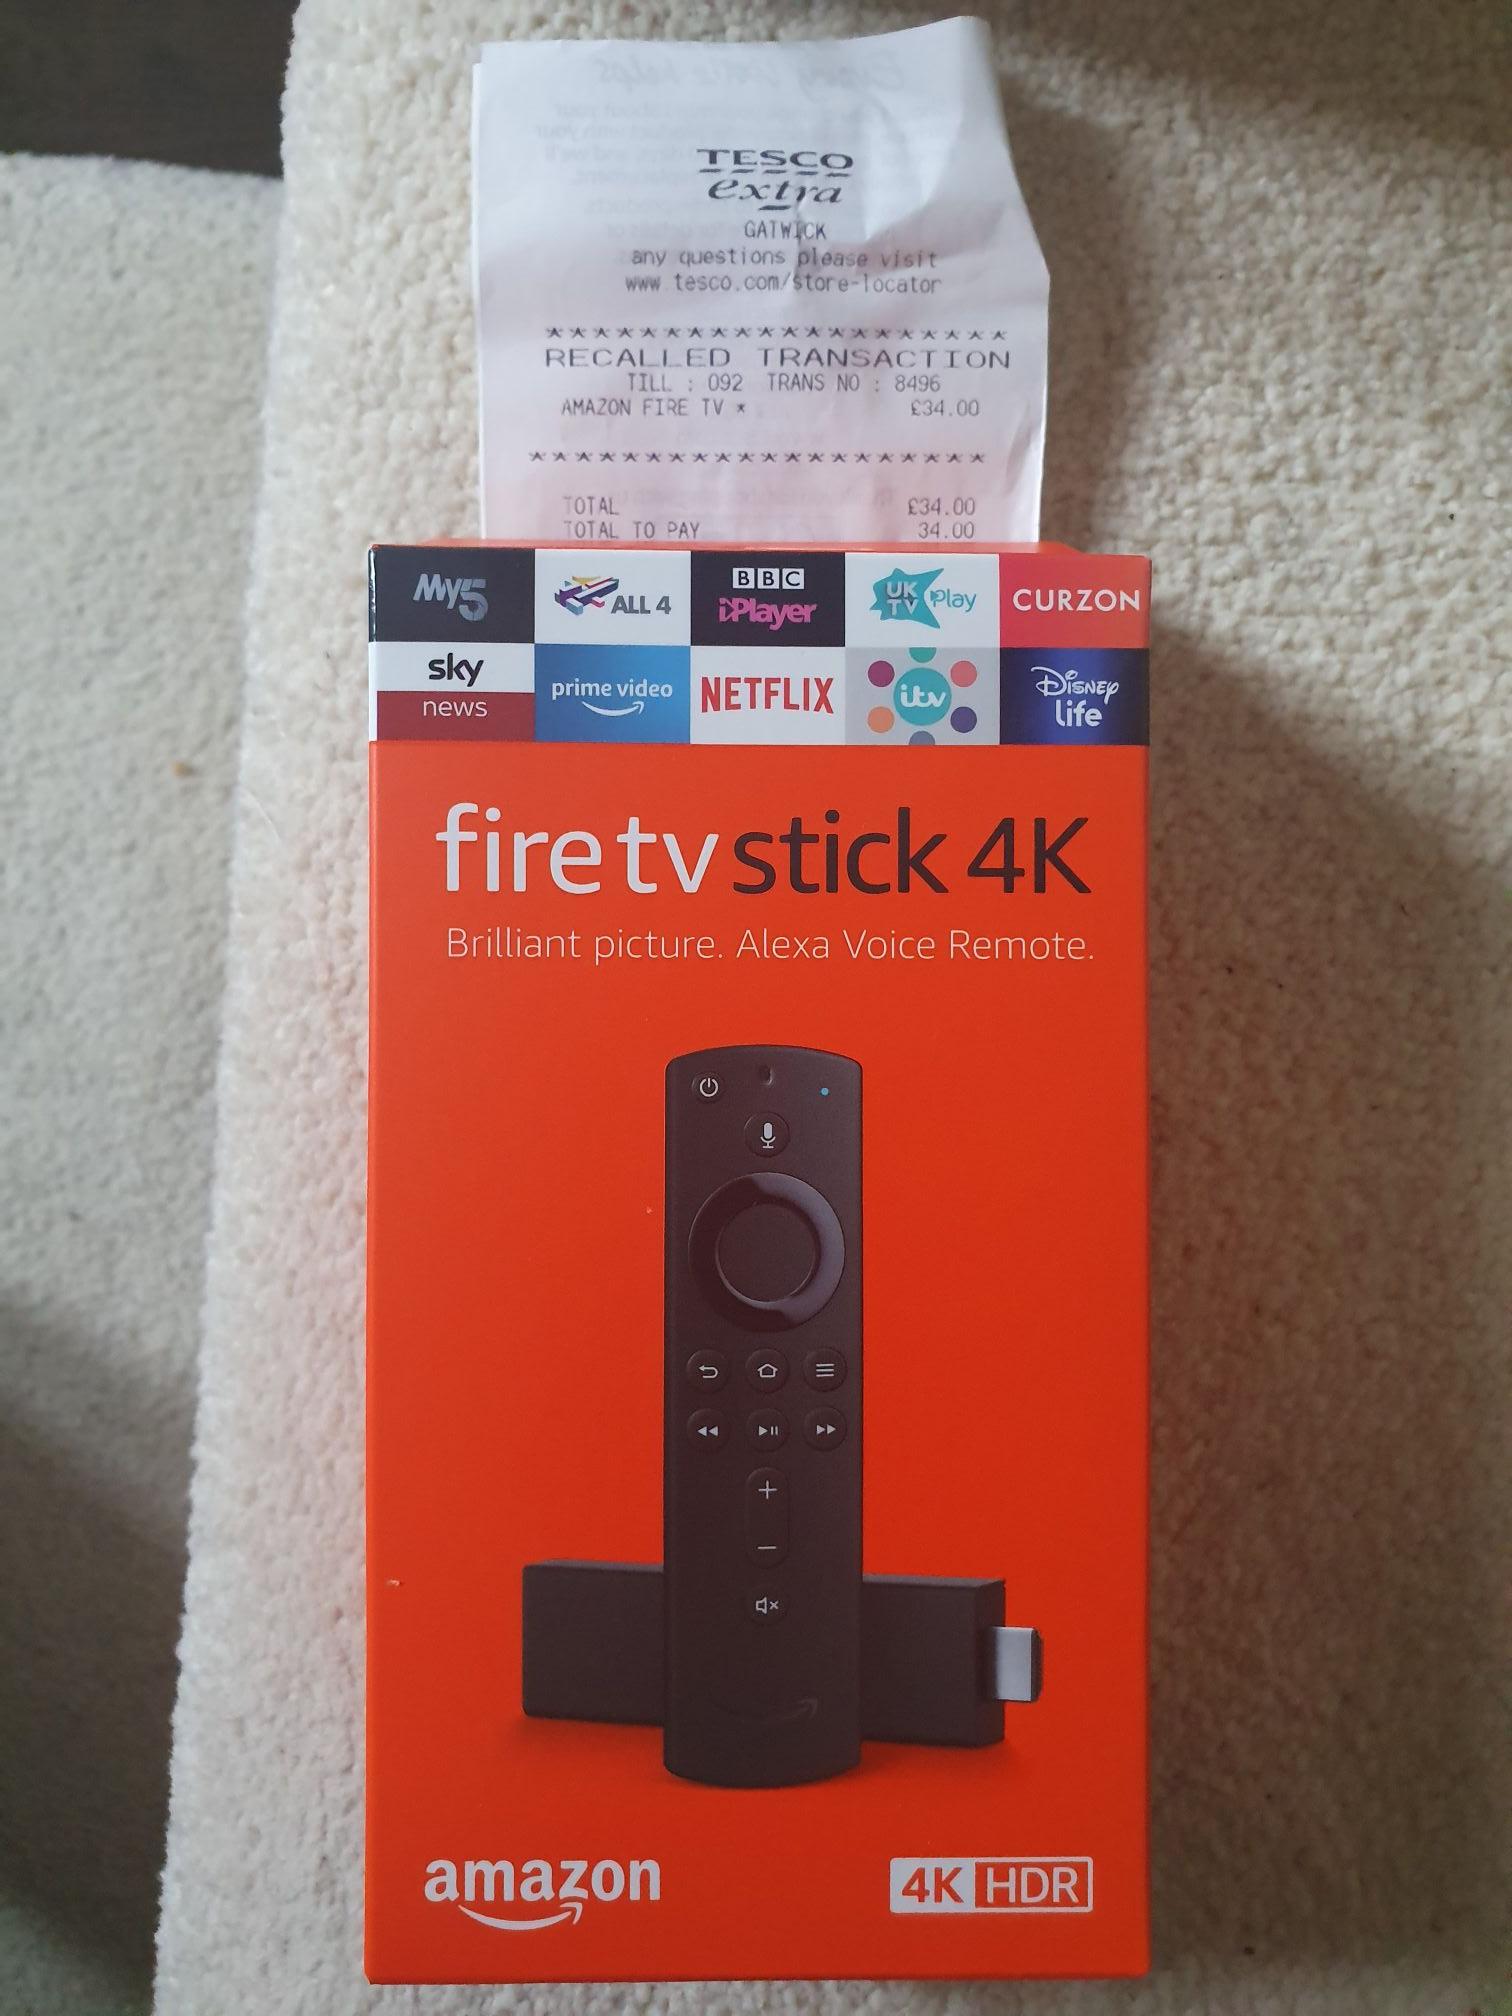 Amazon Fire TV Stick 4K with Alexa voice remote £34 instore @ Tesco Gatwick